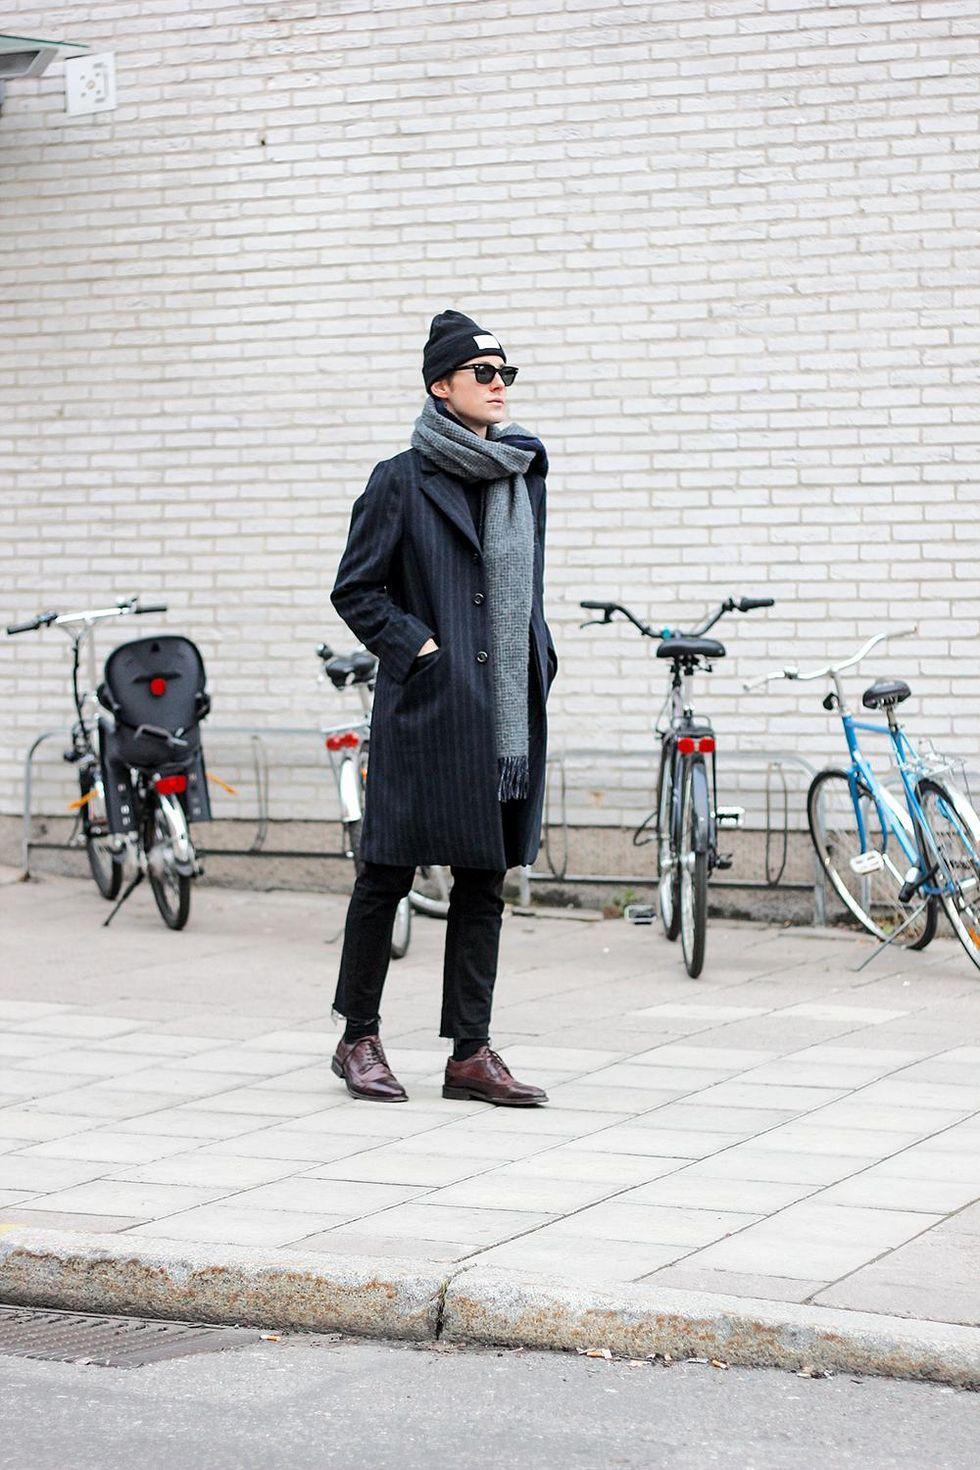 tobias-sikstrom-outfit-8.jpg